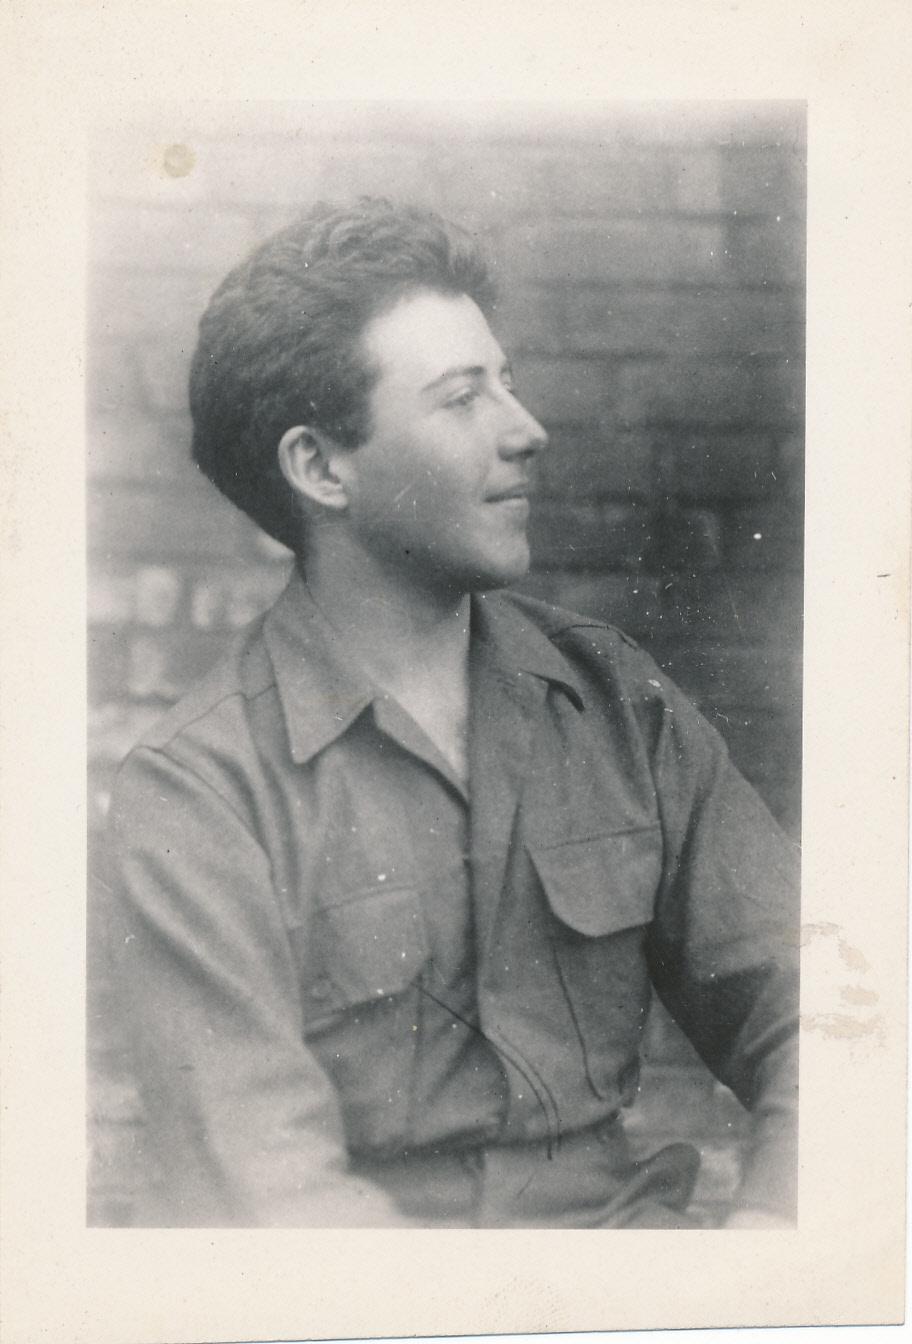 Jacob Rothstein, 1945